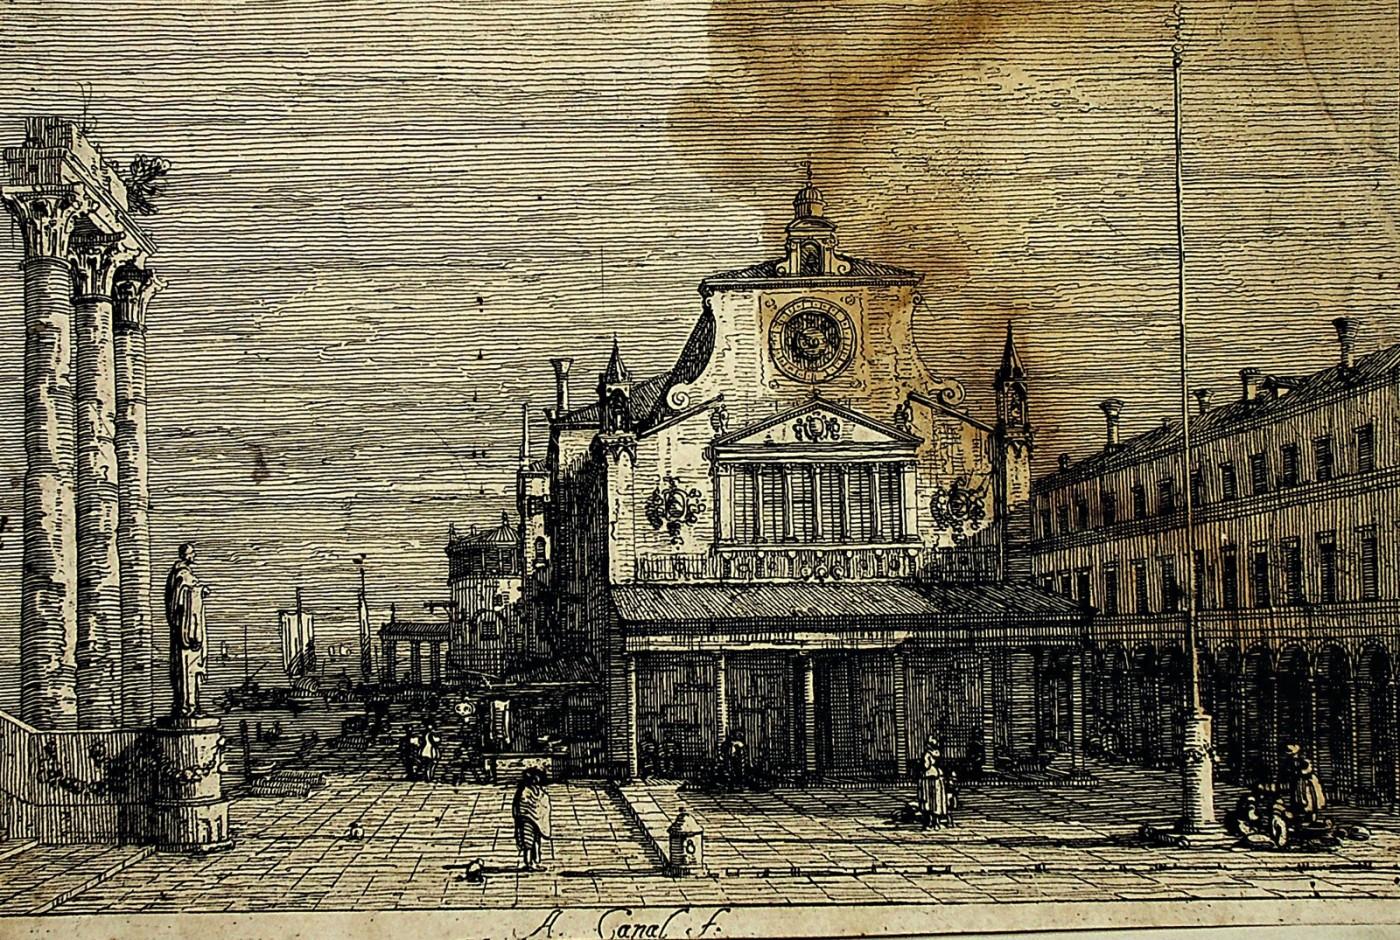 View of the Church of San Giacomo di Rialto in Venice.